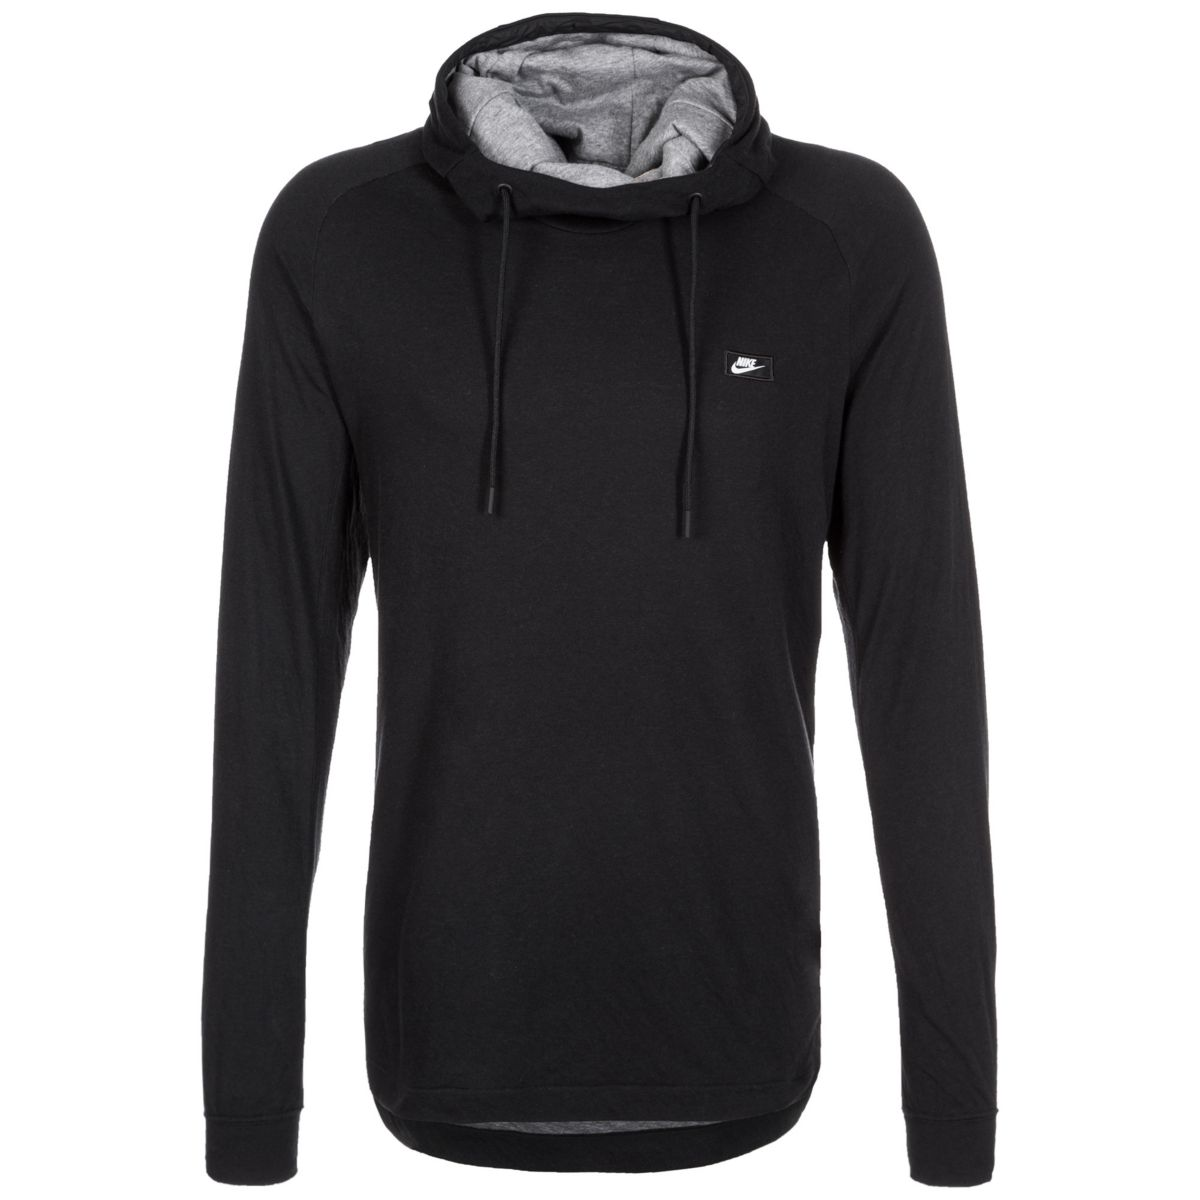 Nike Sportswear Kapuzenpullover »Modern«